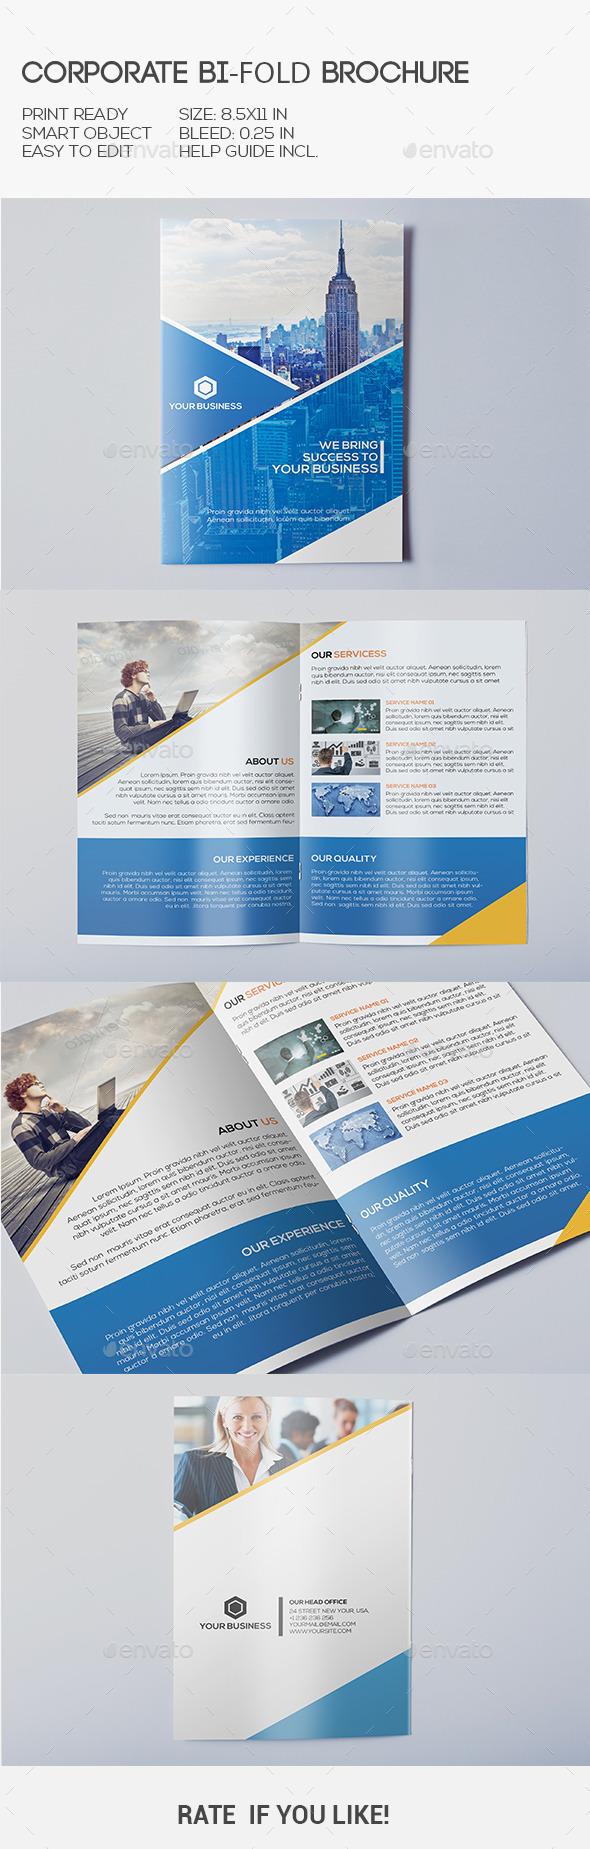 GraphicRiver Corporate Bi-Fold Brochure 10369145